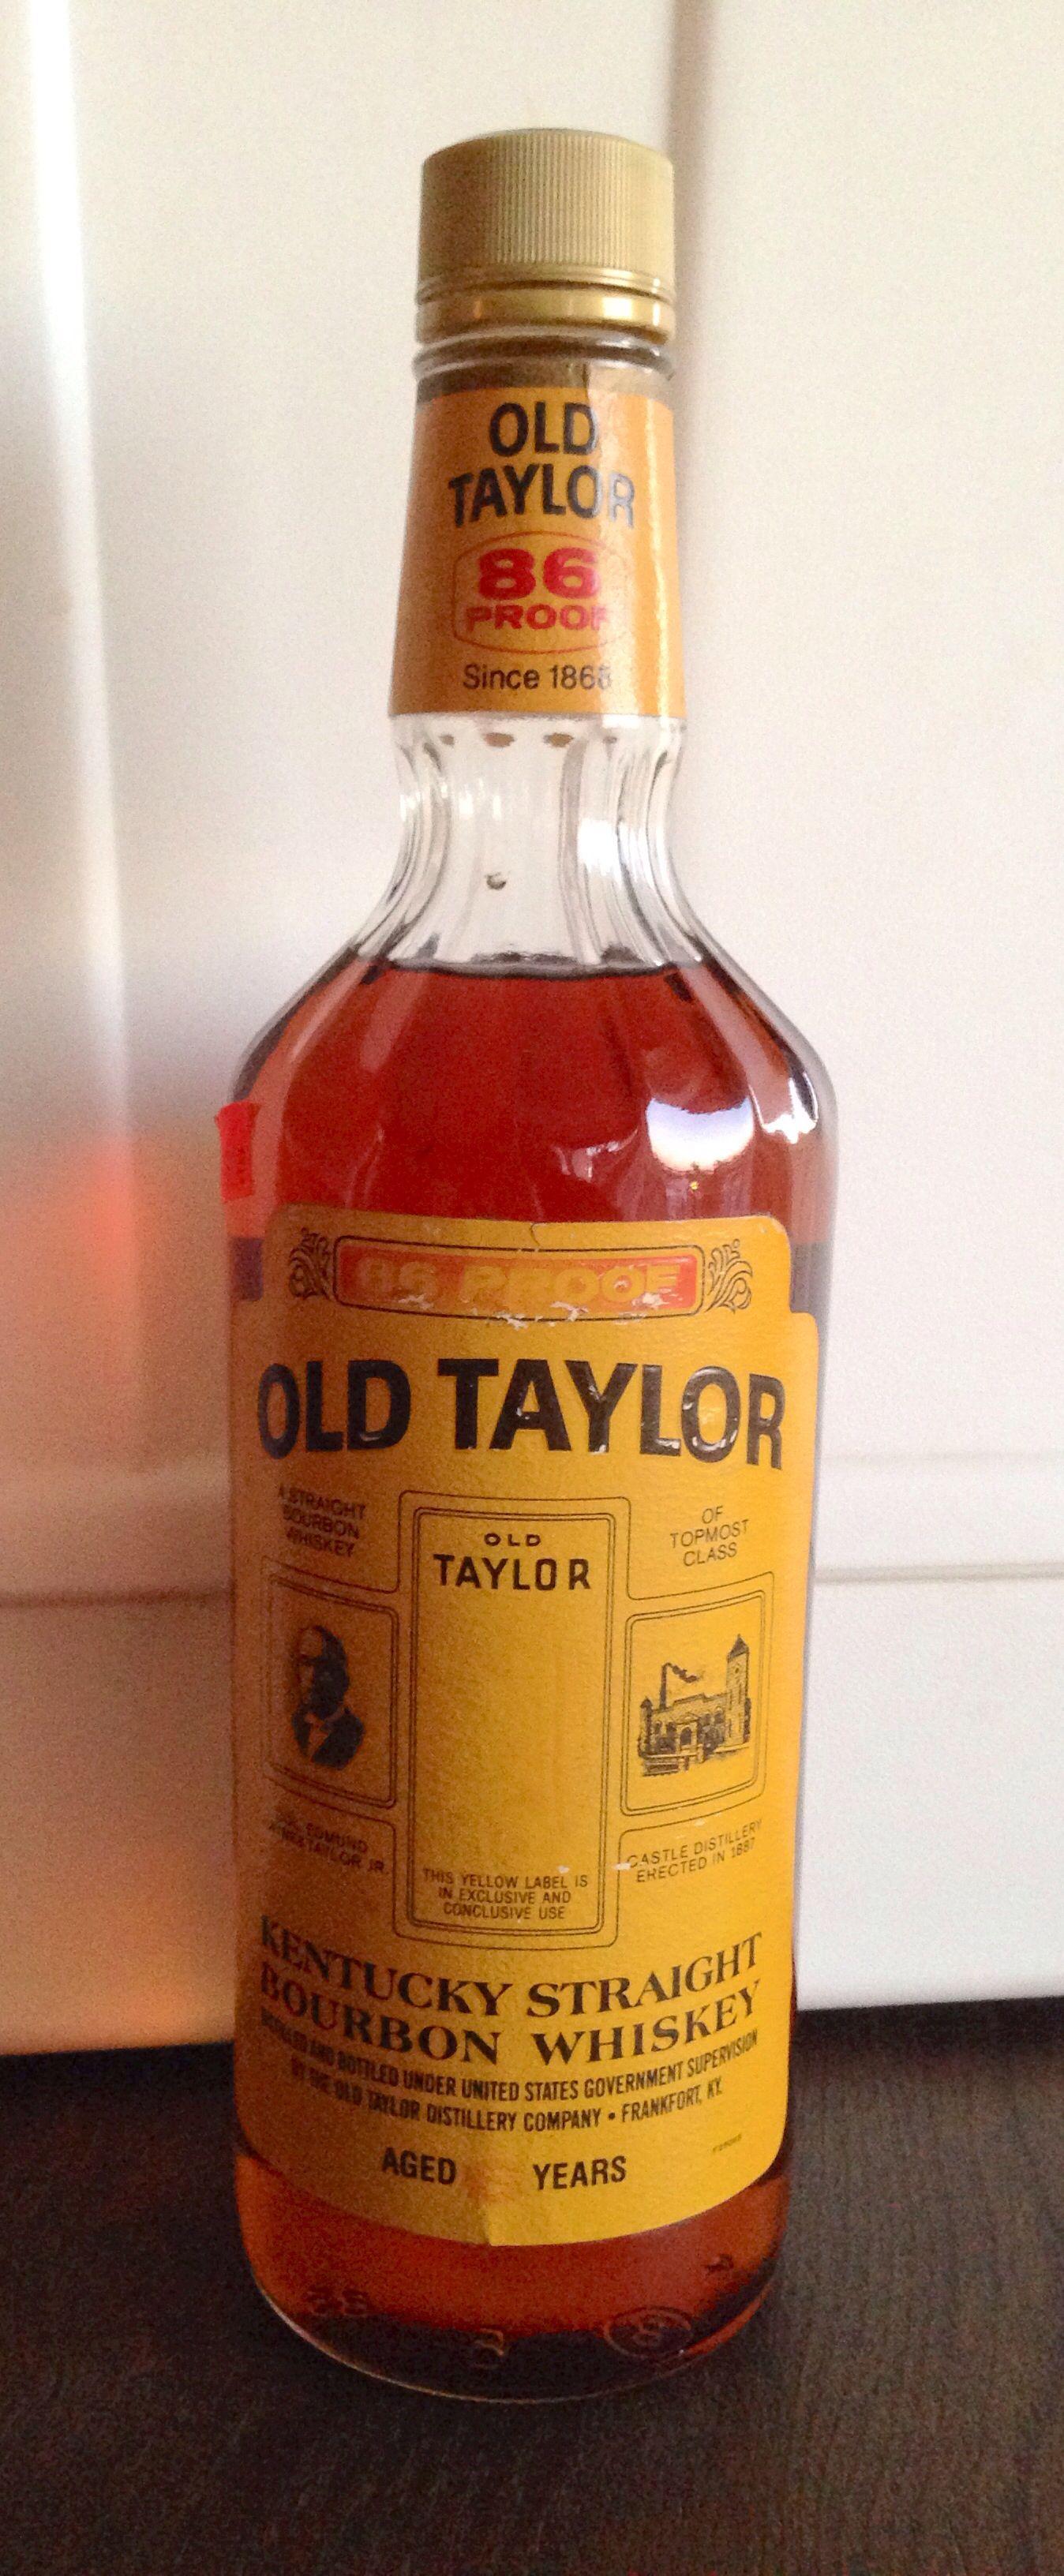 Old Taylor 6 year old bourbon (1985) National Distillers era